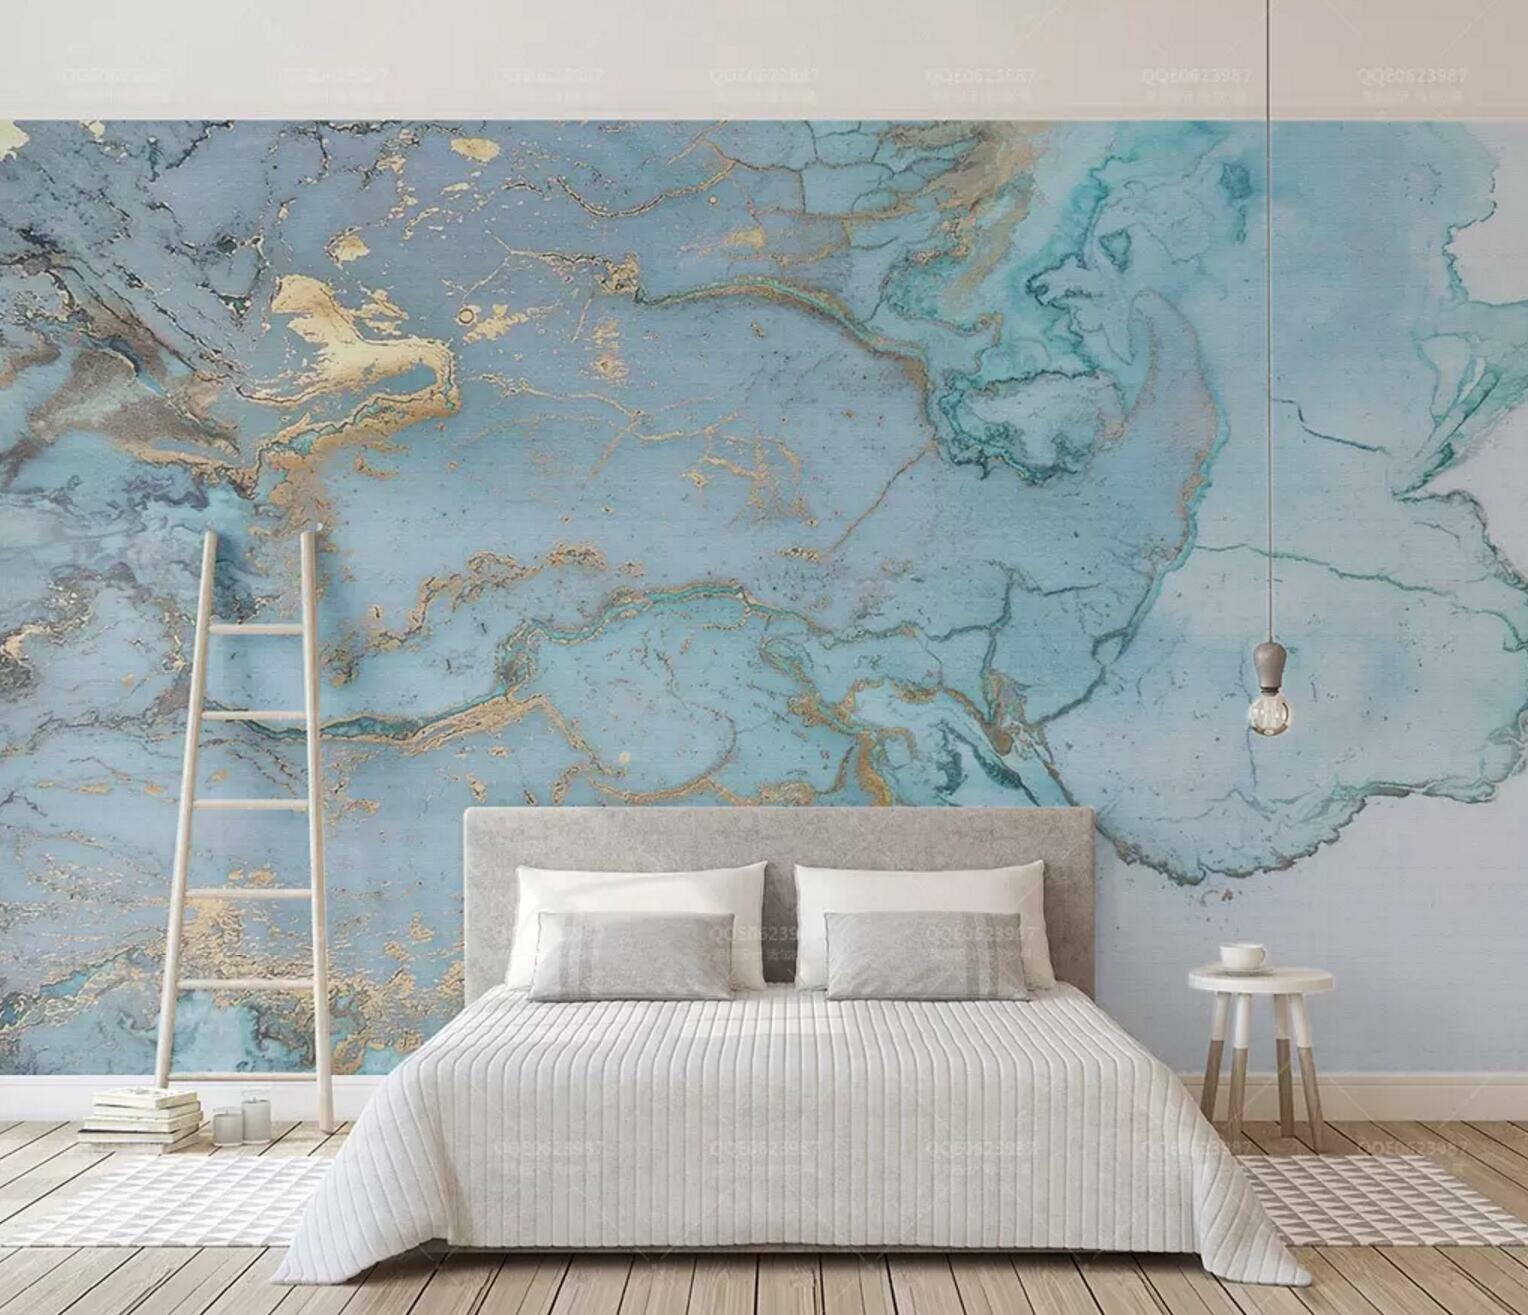 3D Blau Watercolor 3 Wall Paper Exclusive MXY Wallpaper Mural Decal Indoor wall